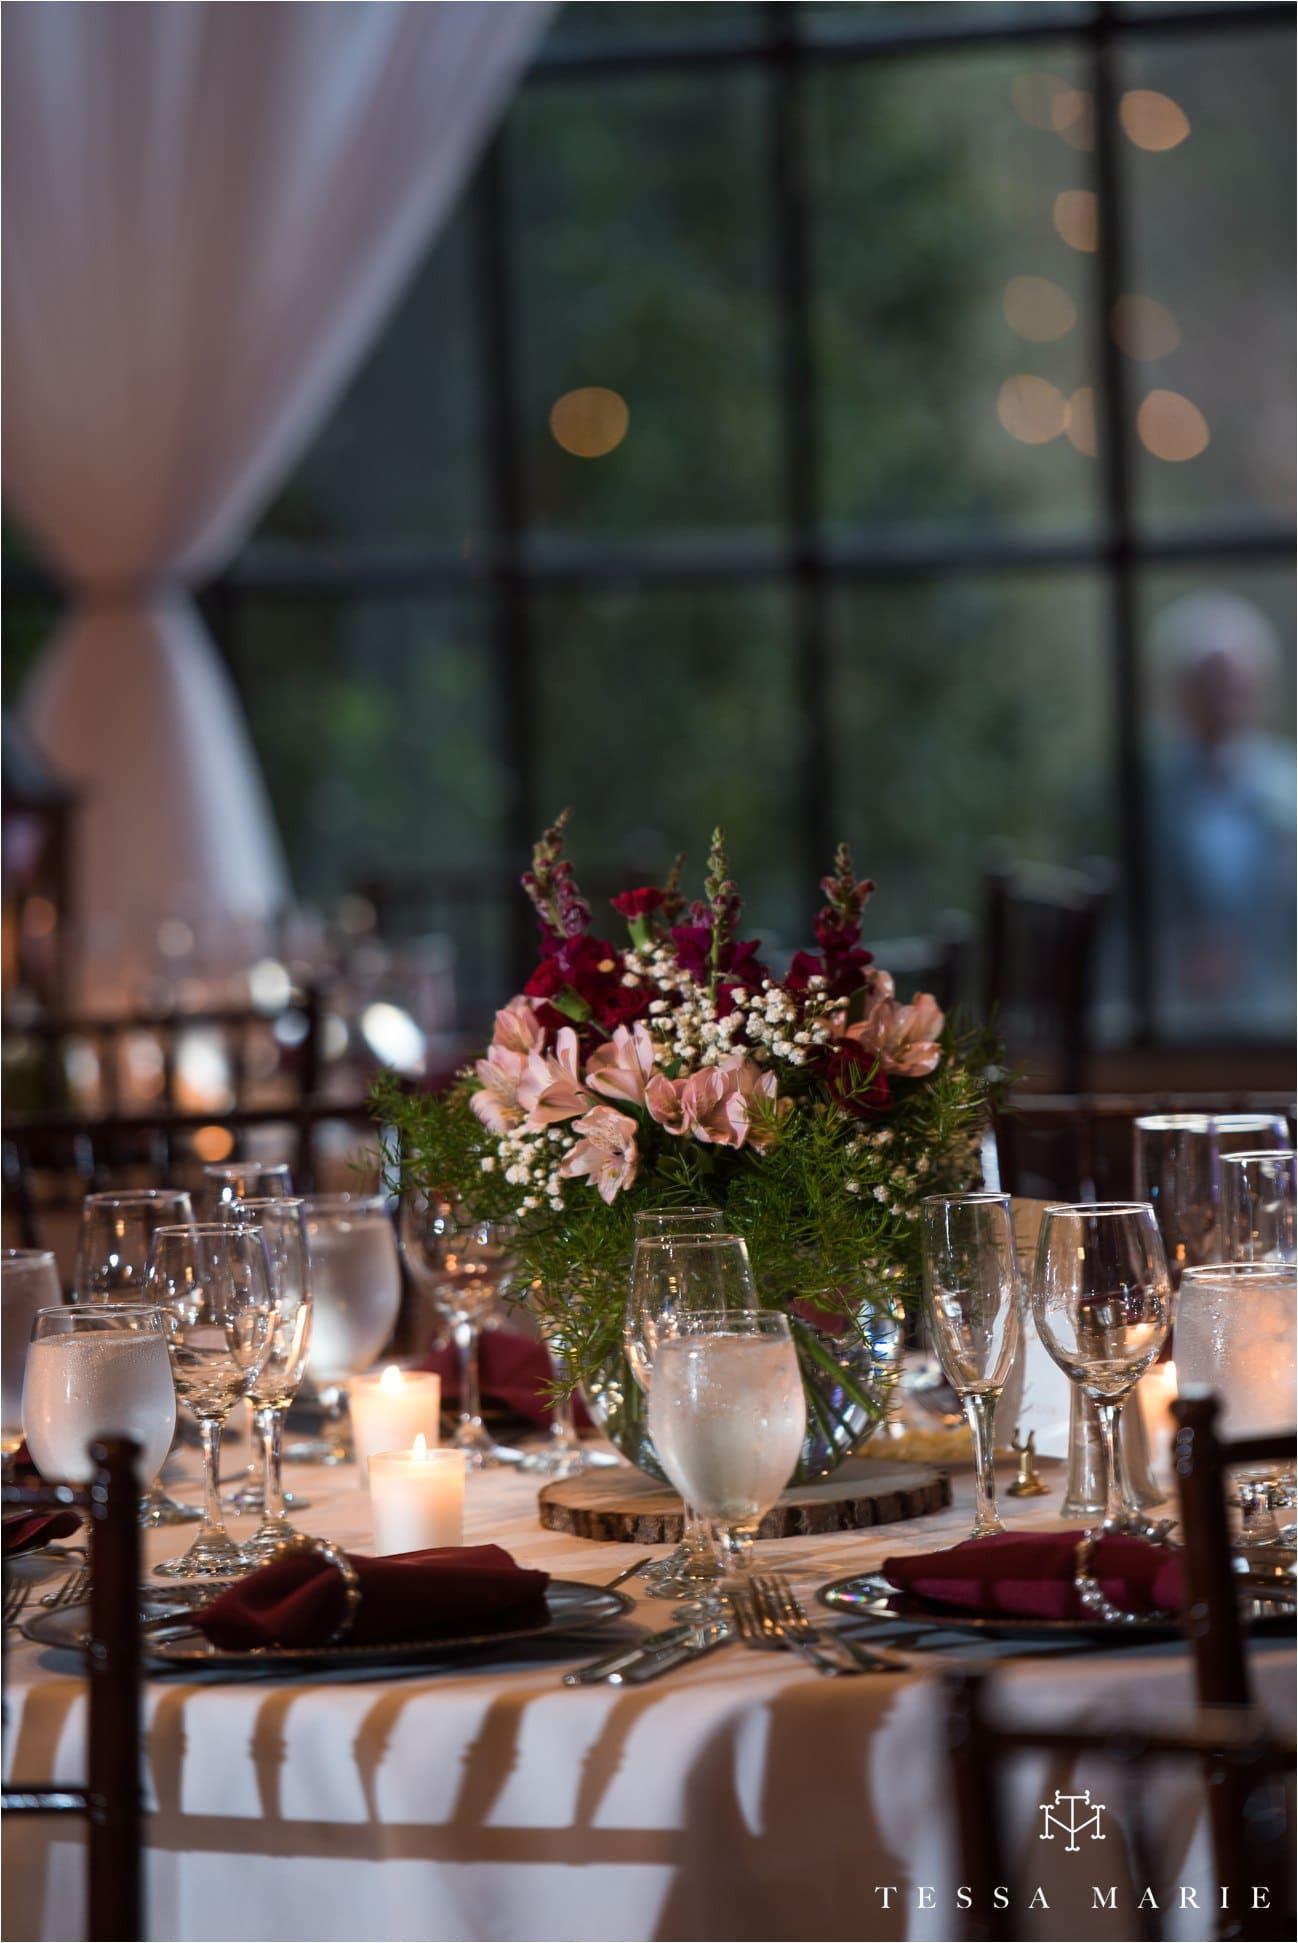 tessa_marie_weddings_rivermill_event_centere_candid_outdoor_wedding_photos_0311